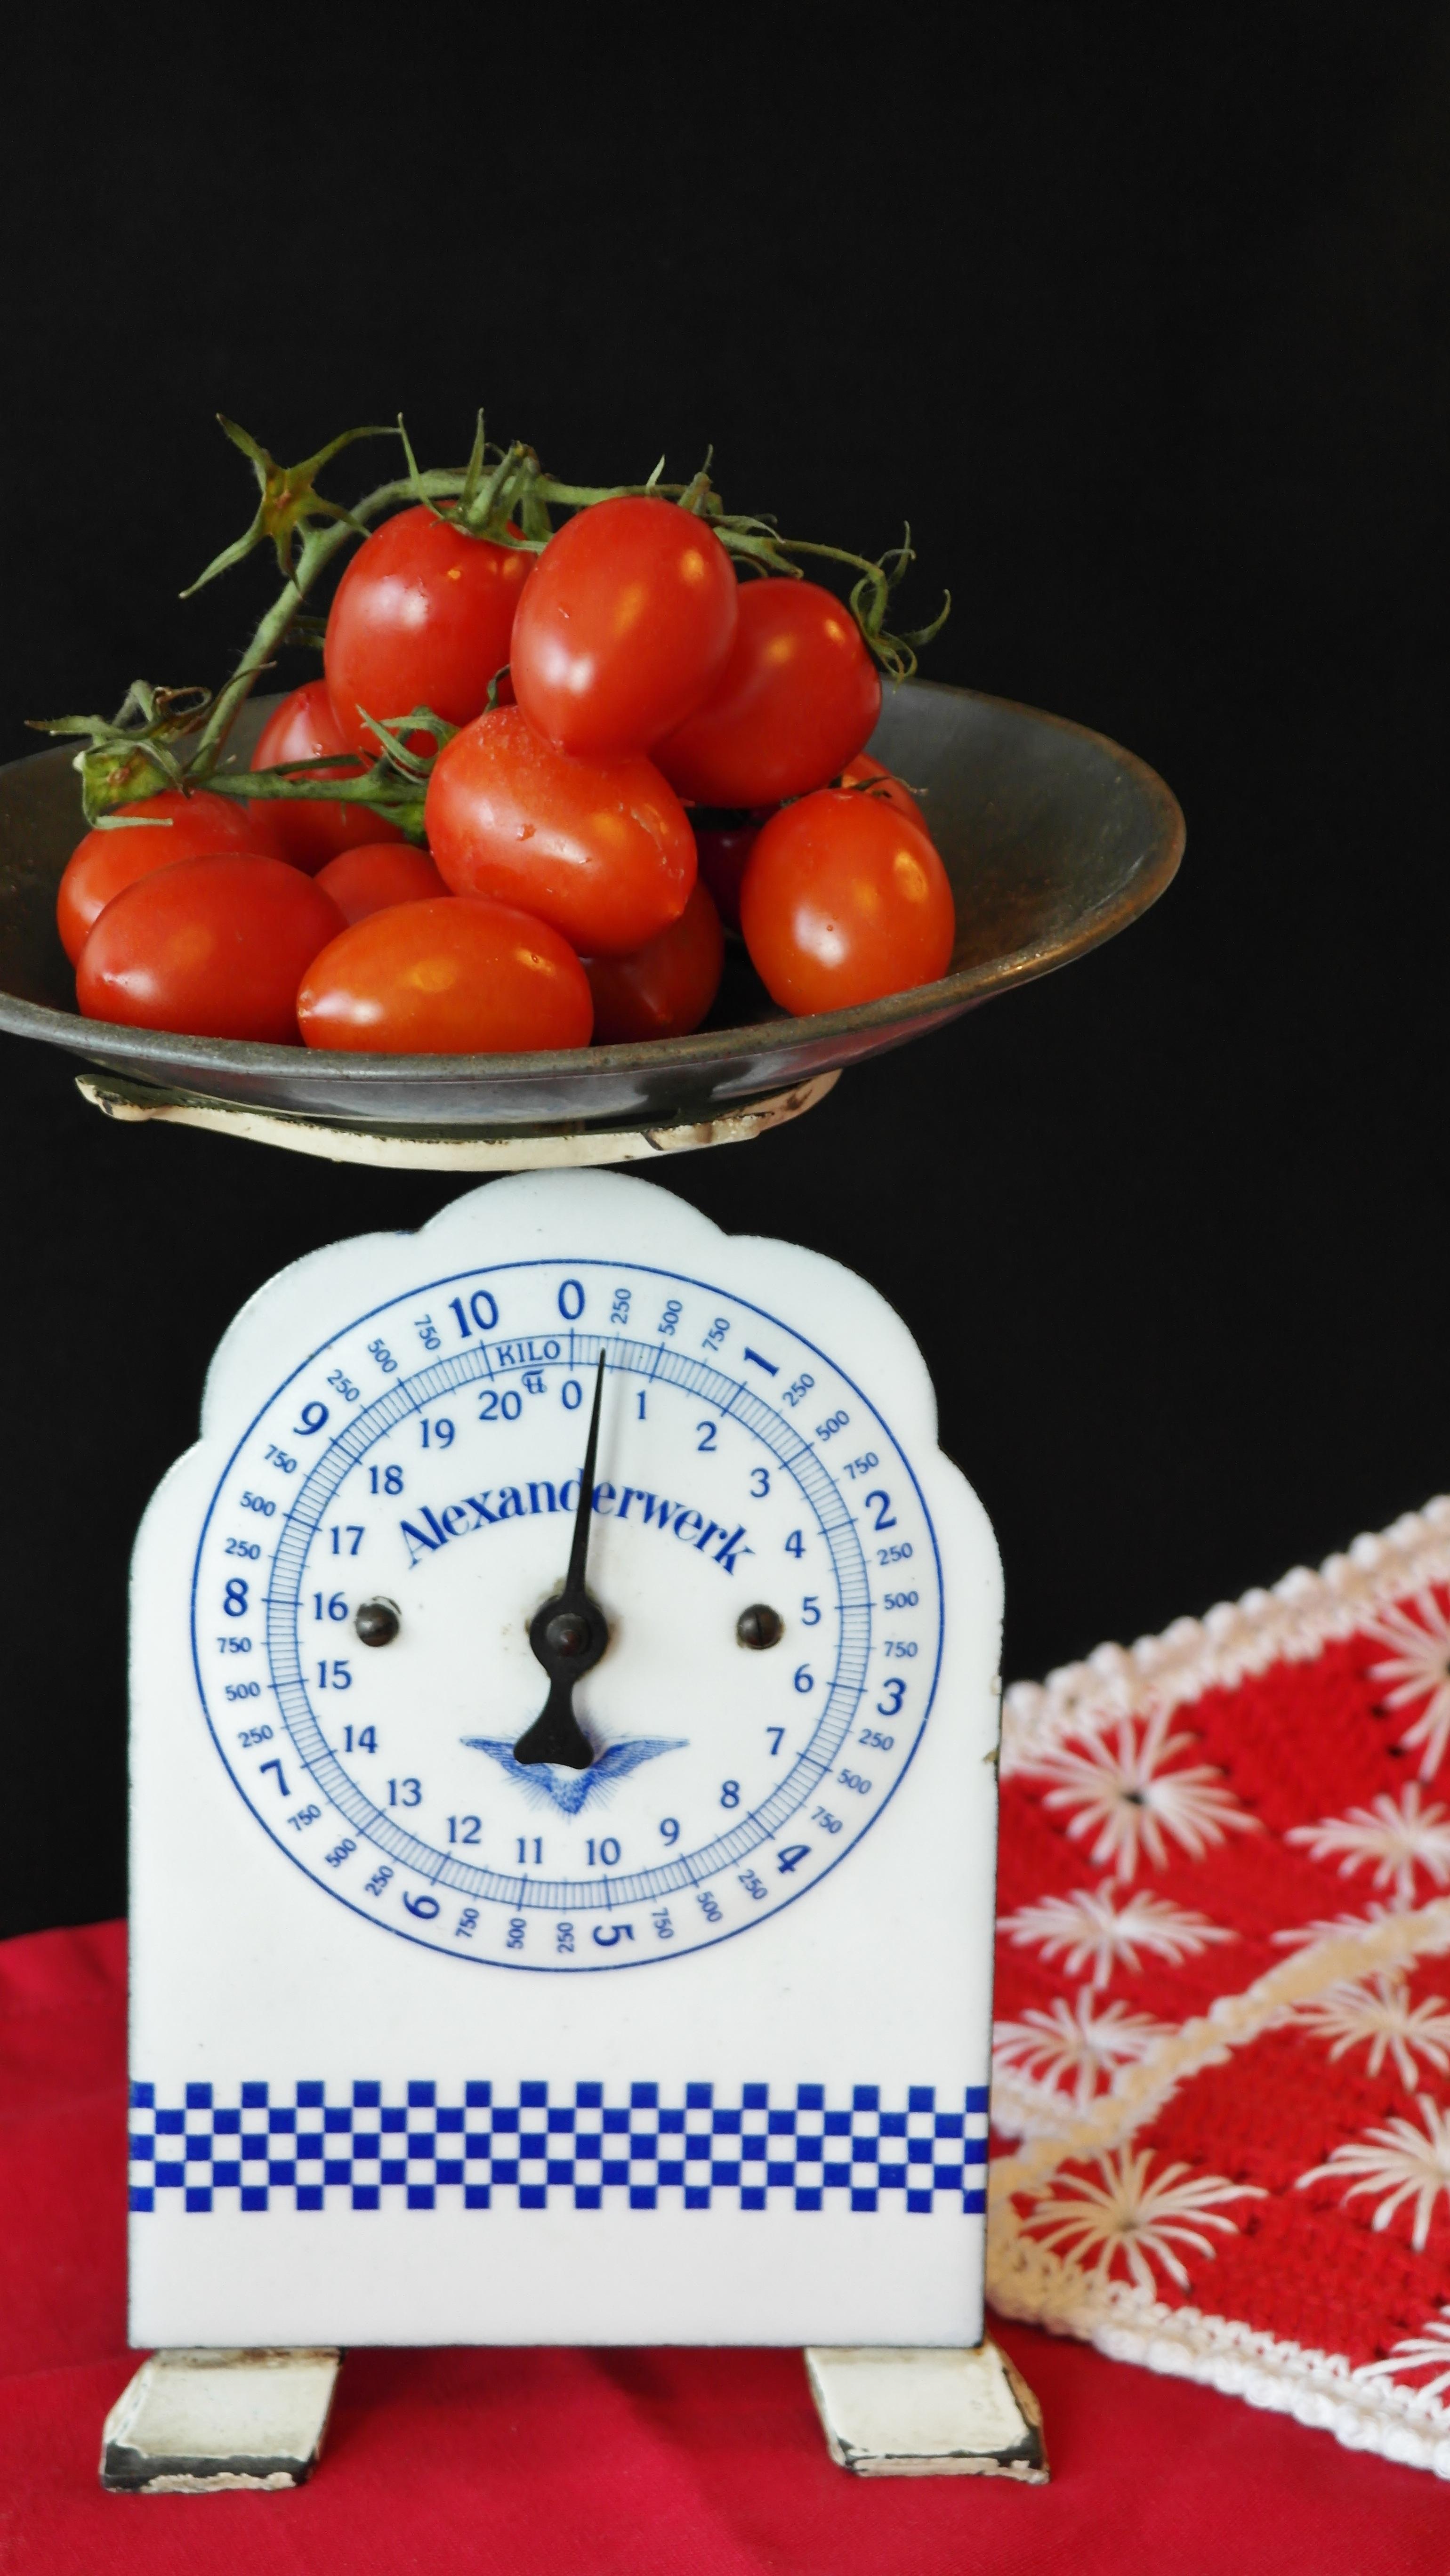 Gambar Menanam Antik Buah Tua Makan Makanan Salad Merah Menghasilkan Sayur Mayur Dapur Menimbang Sehat Masih Hidup Tomat Kalori Sayuran